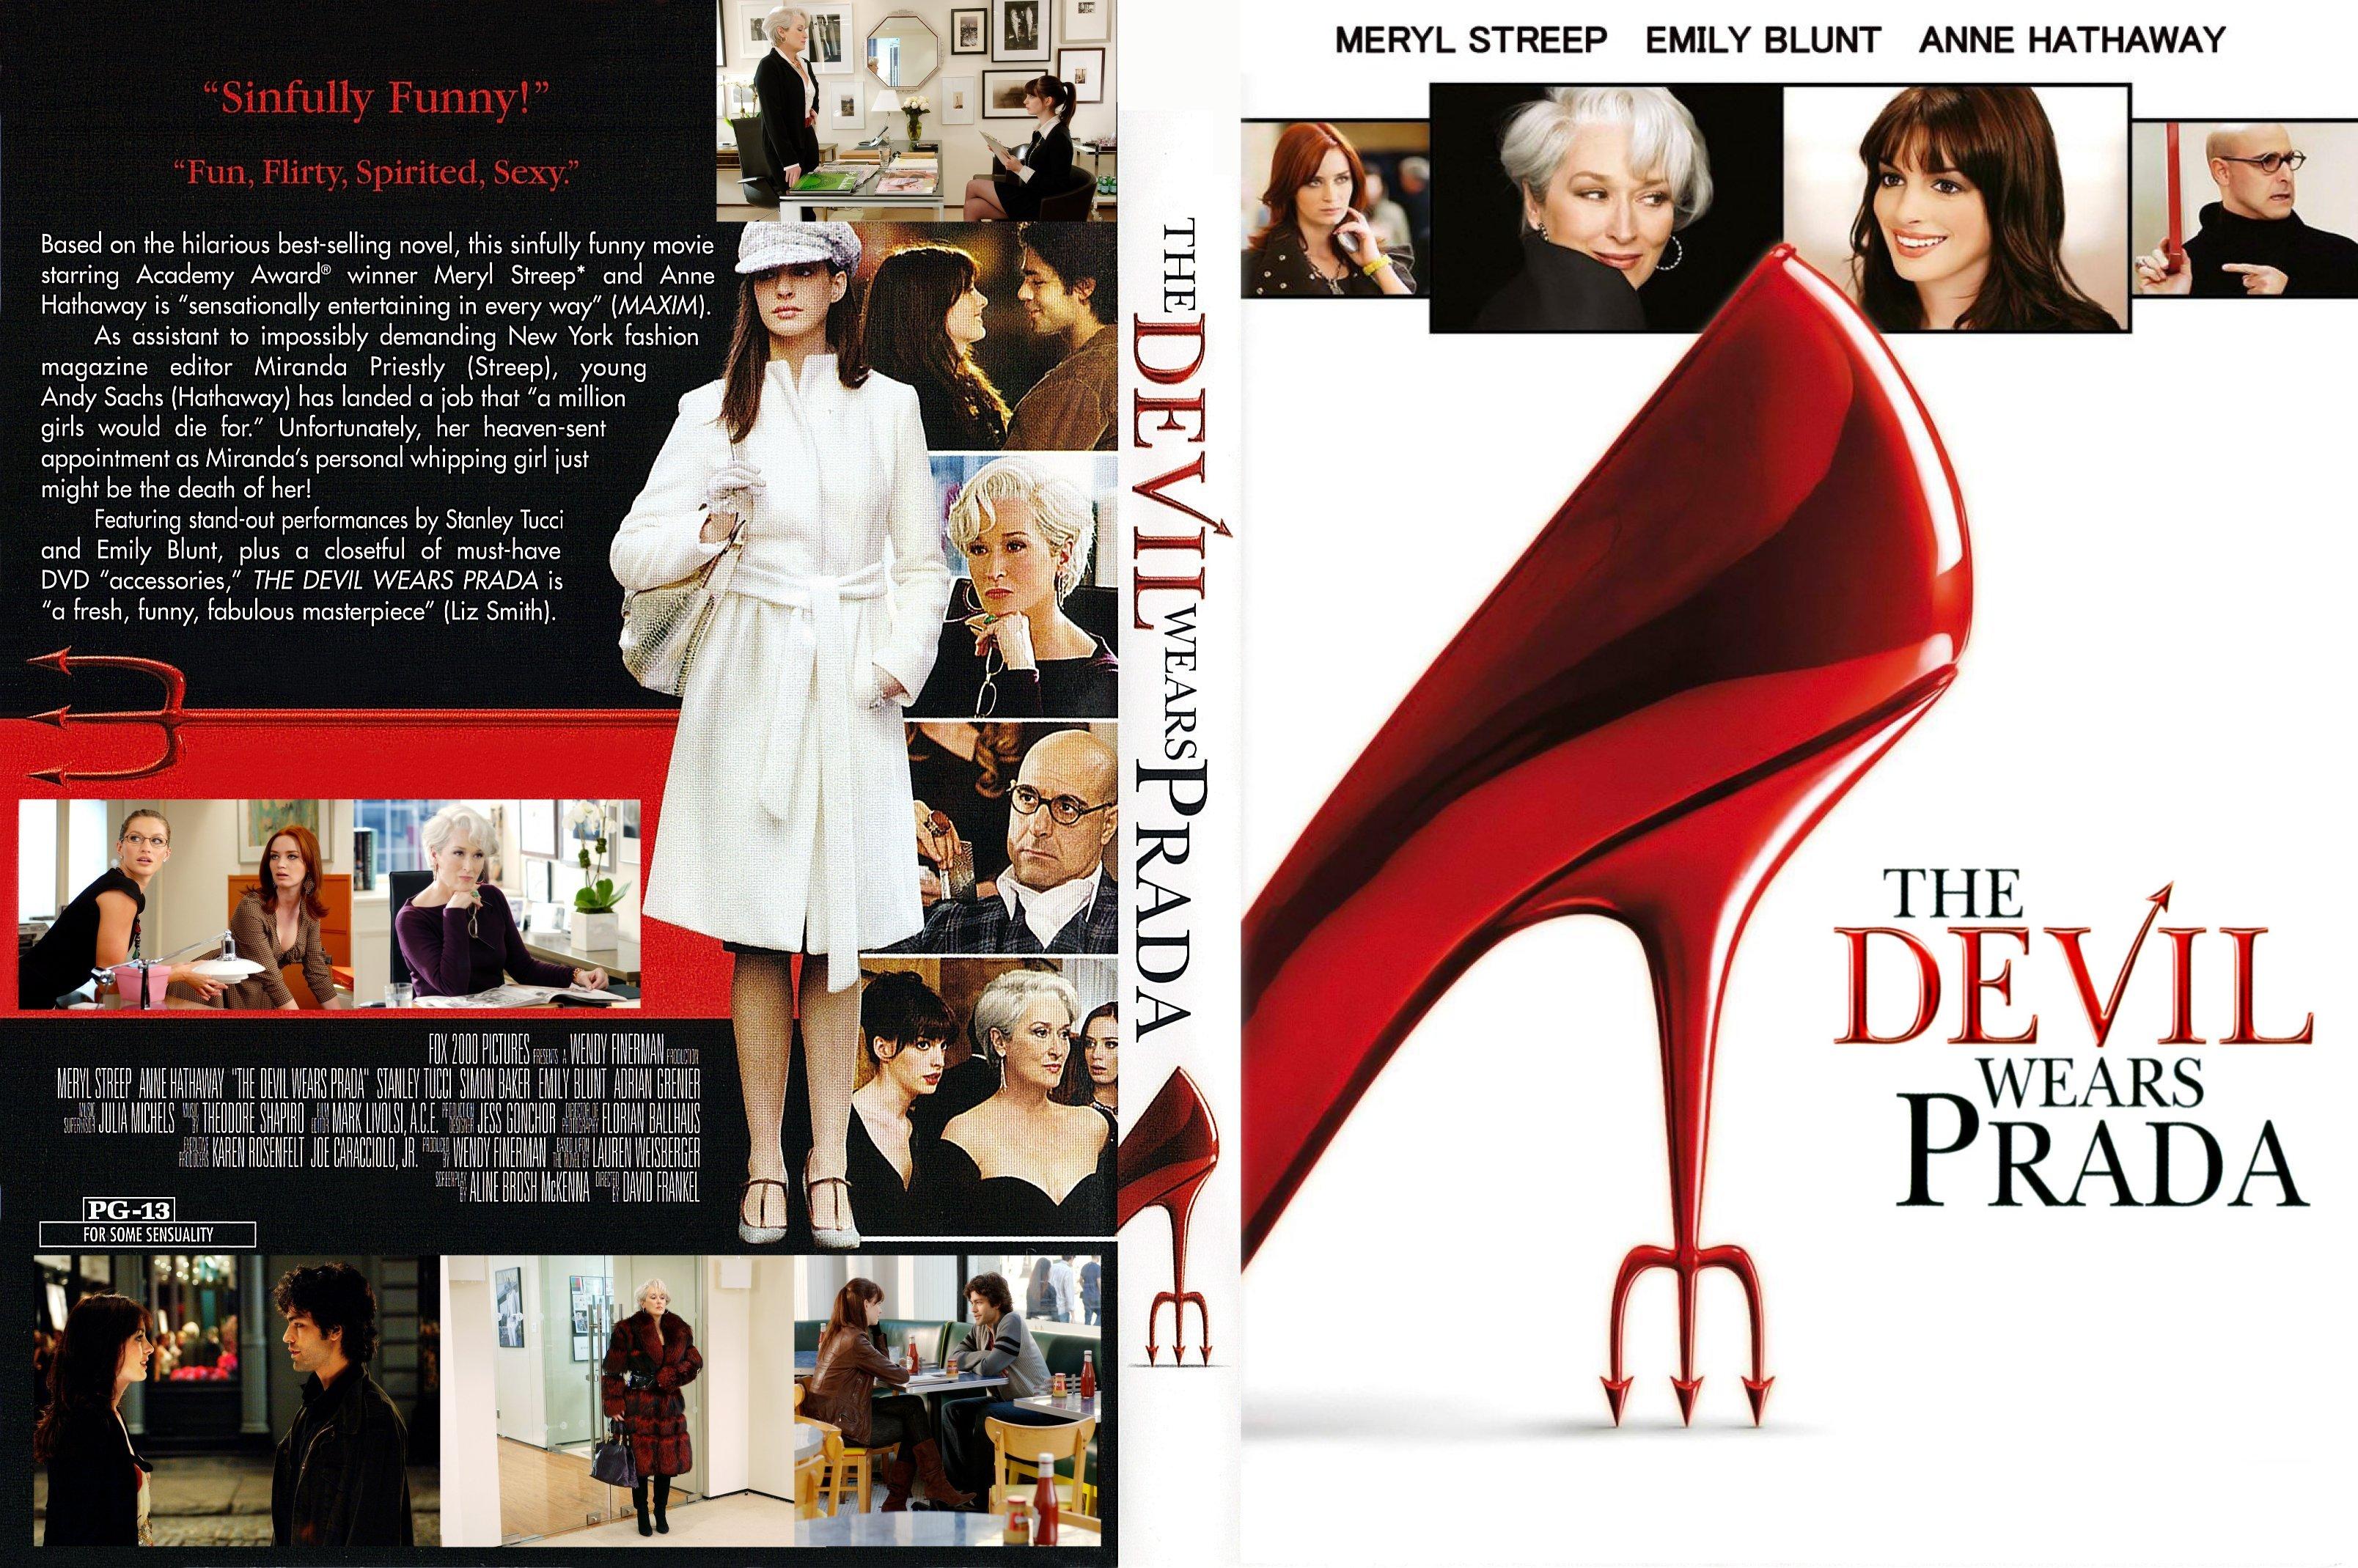 The Devil Wears Prada 2006  IMDb